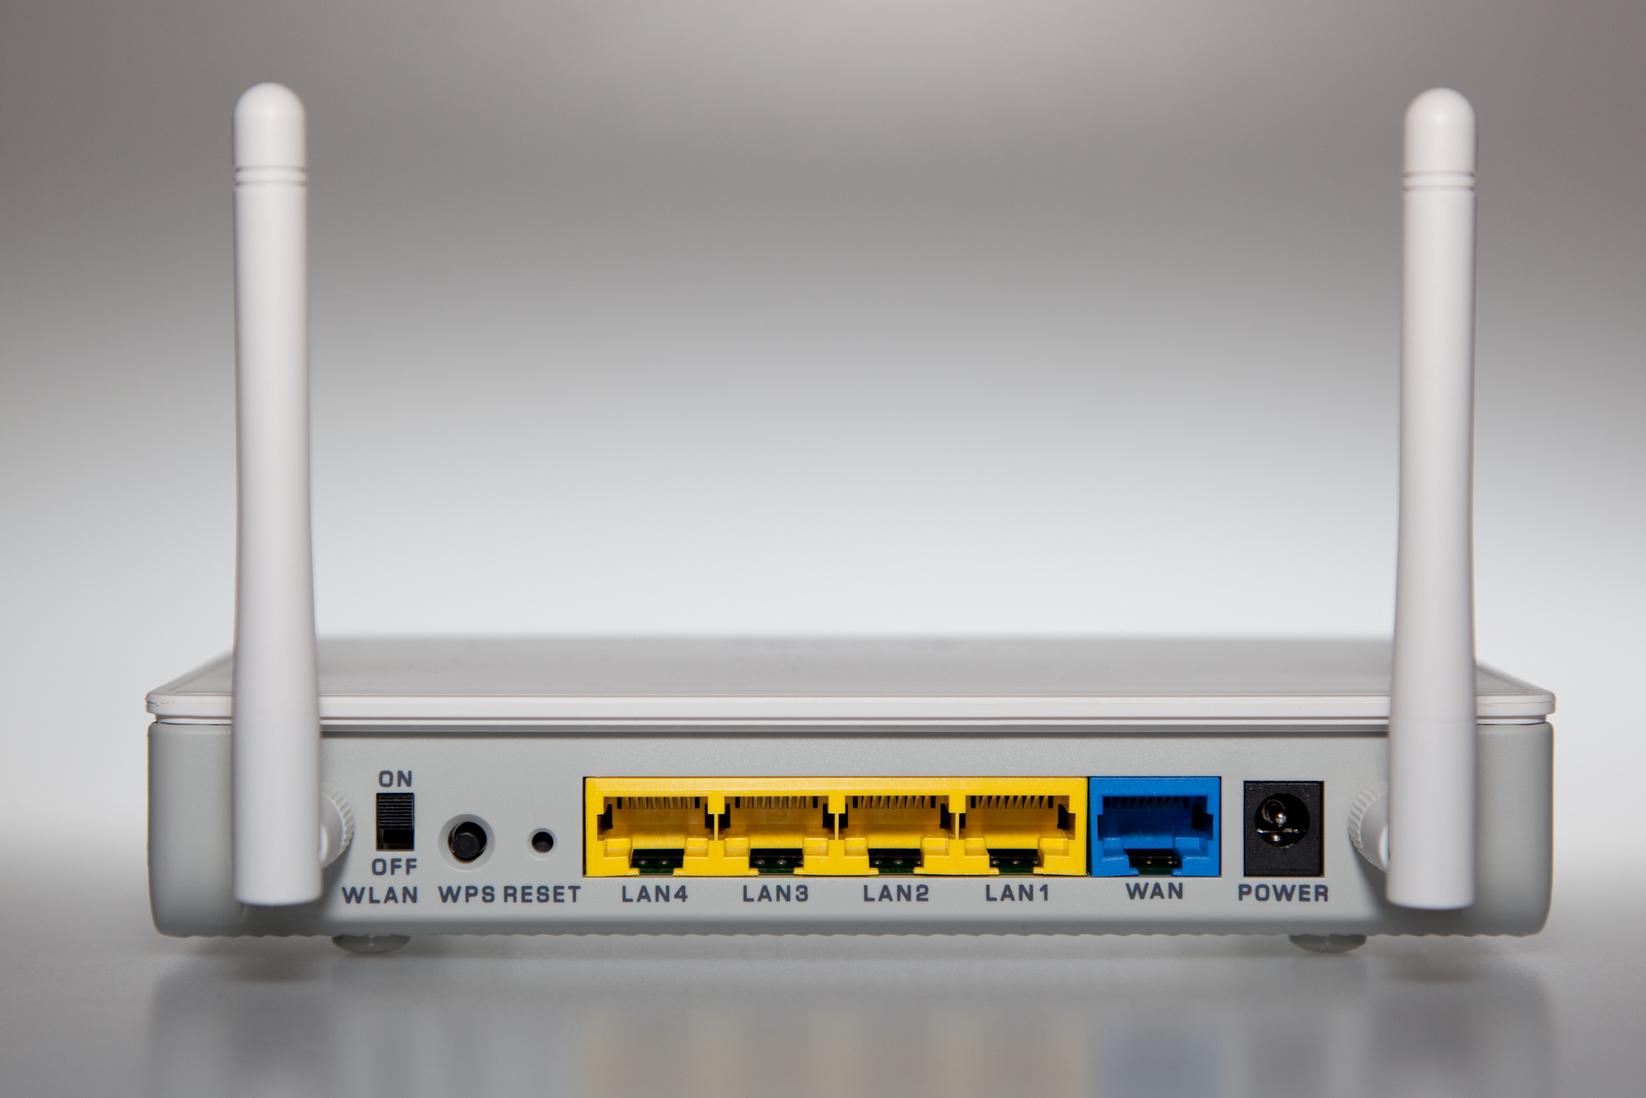 Кнопка wps на wifi роутере и модеме (qss) — что означает, где находится и зачем нужна на tp-link, zyxel, keenetic или asus?